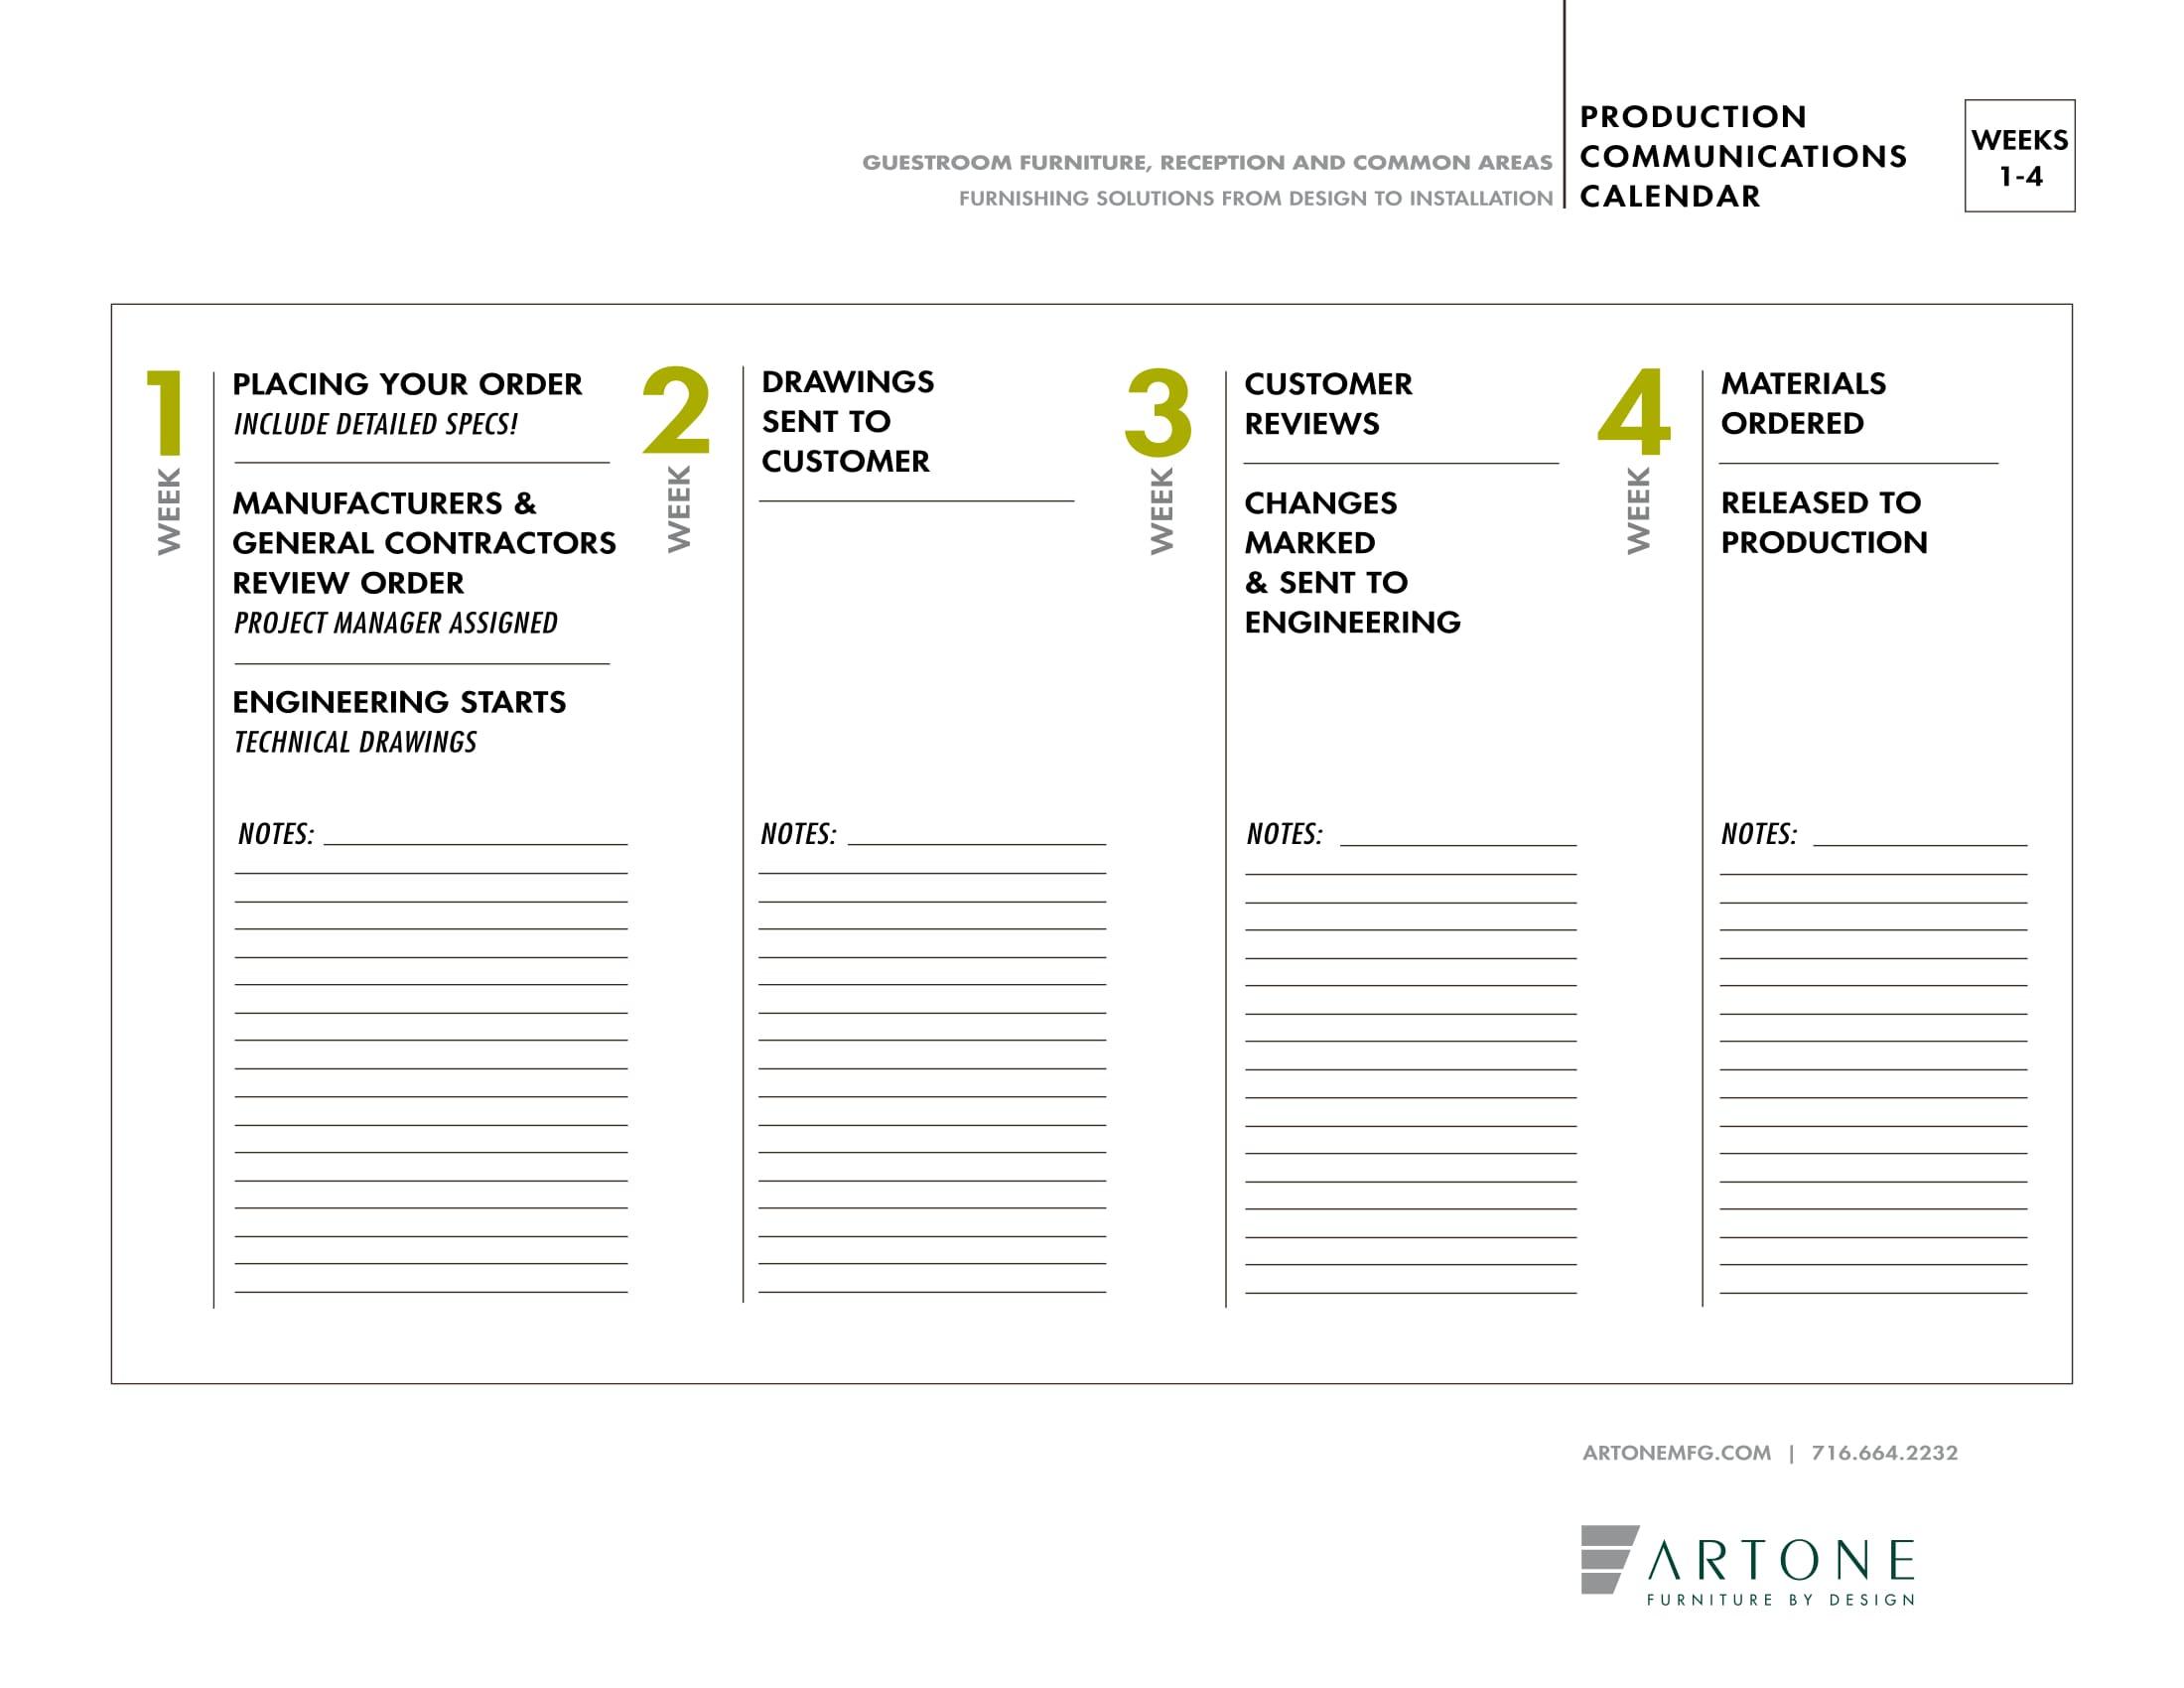 artone_prod comm calendar-1.jpg